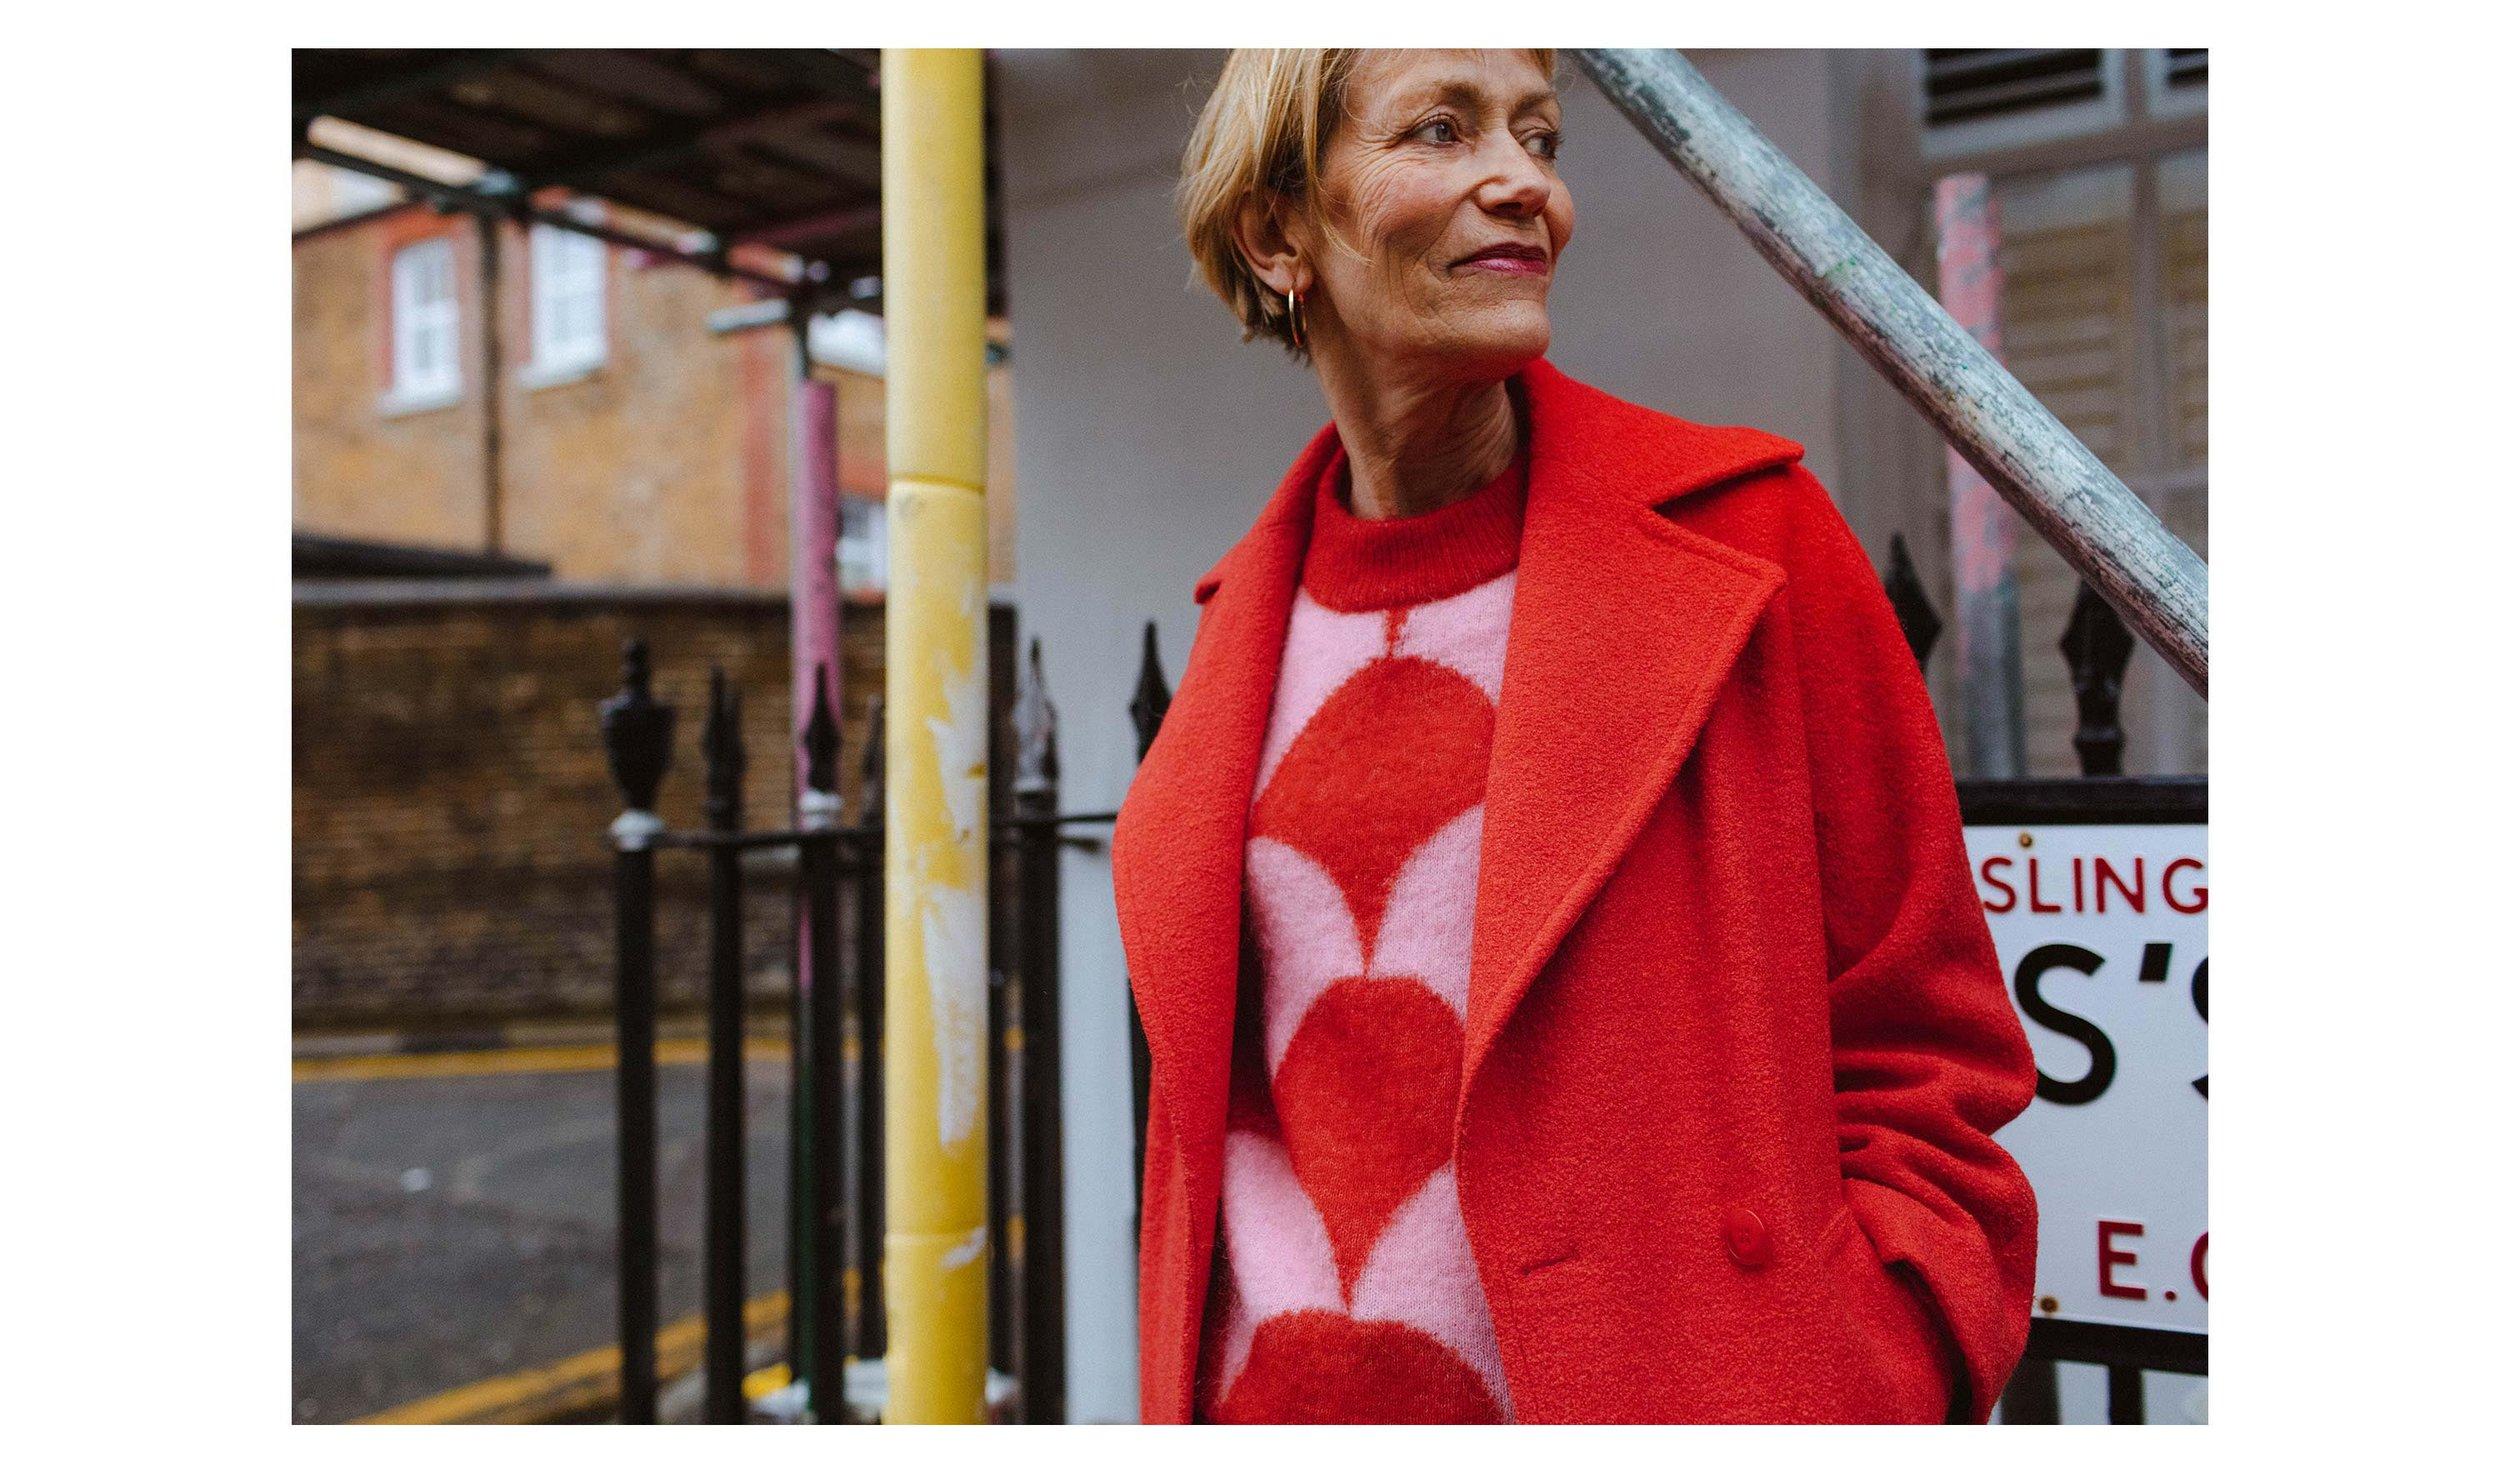 Red-coat-30.jpg